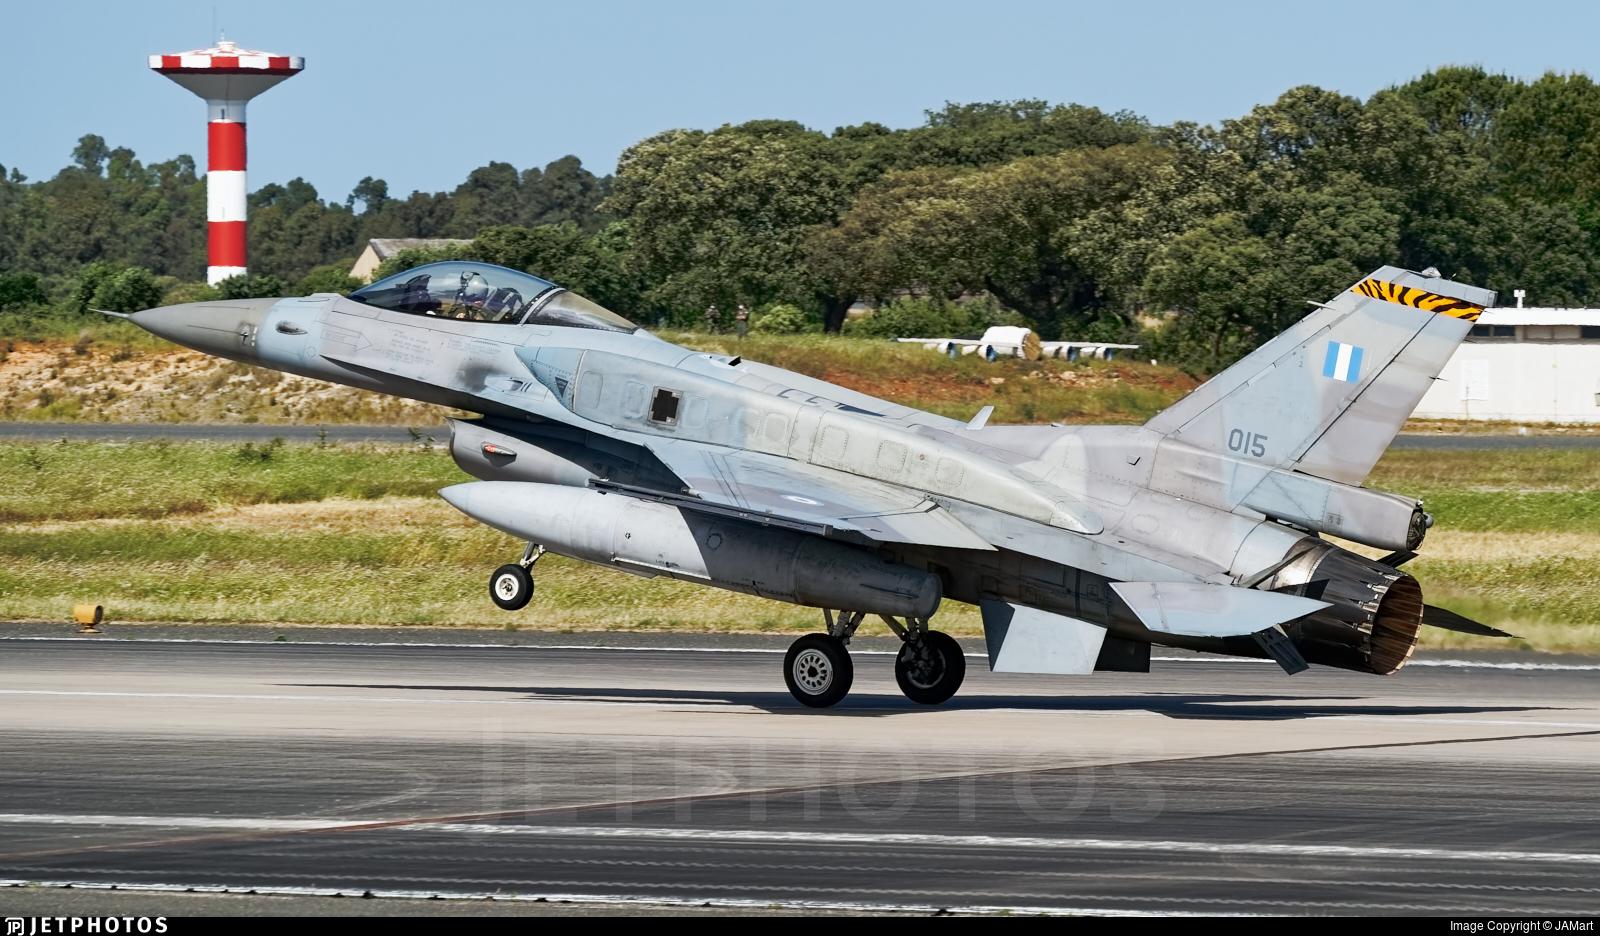 015 - Lockheed Martin F-16C Fighting Falcon - Greece - Air Force